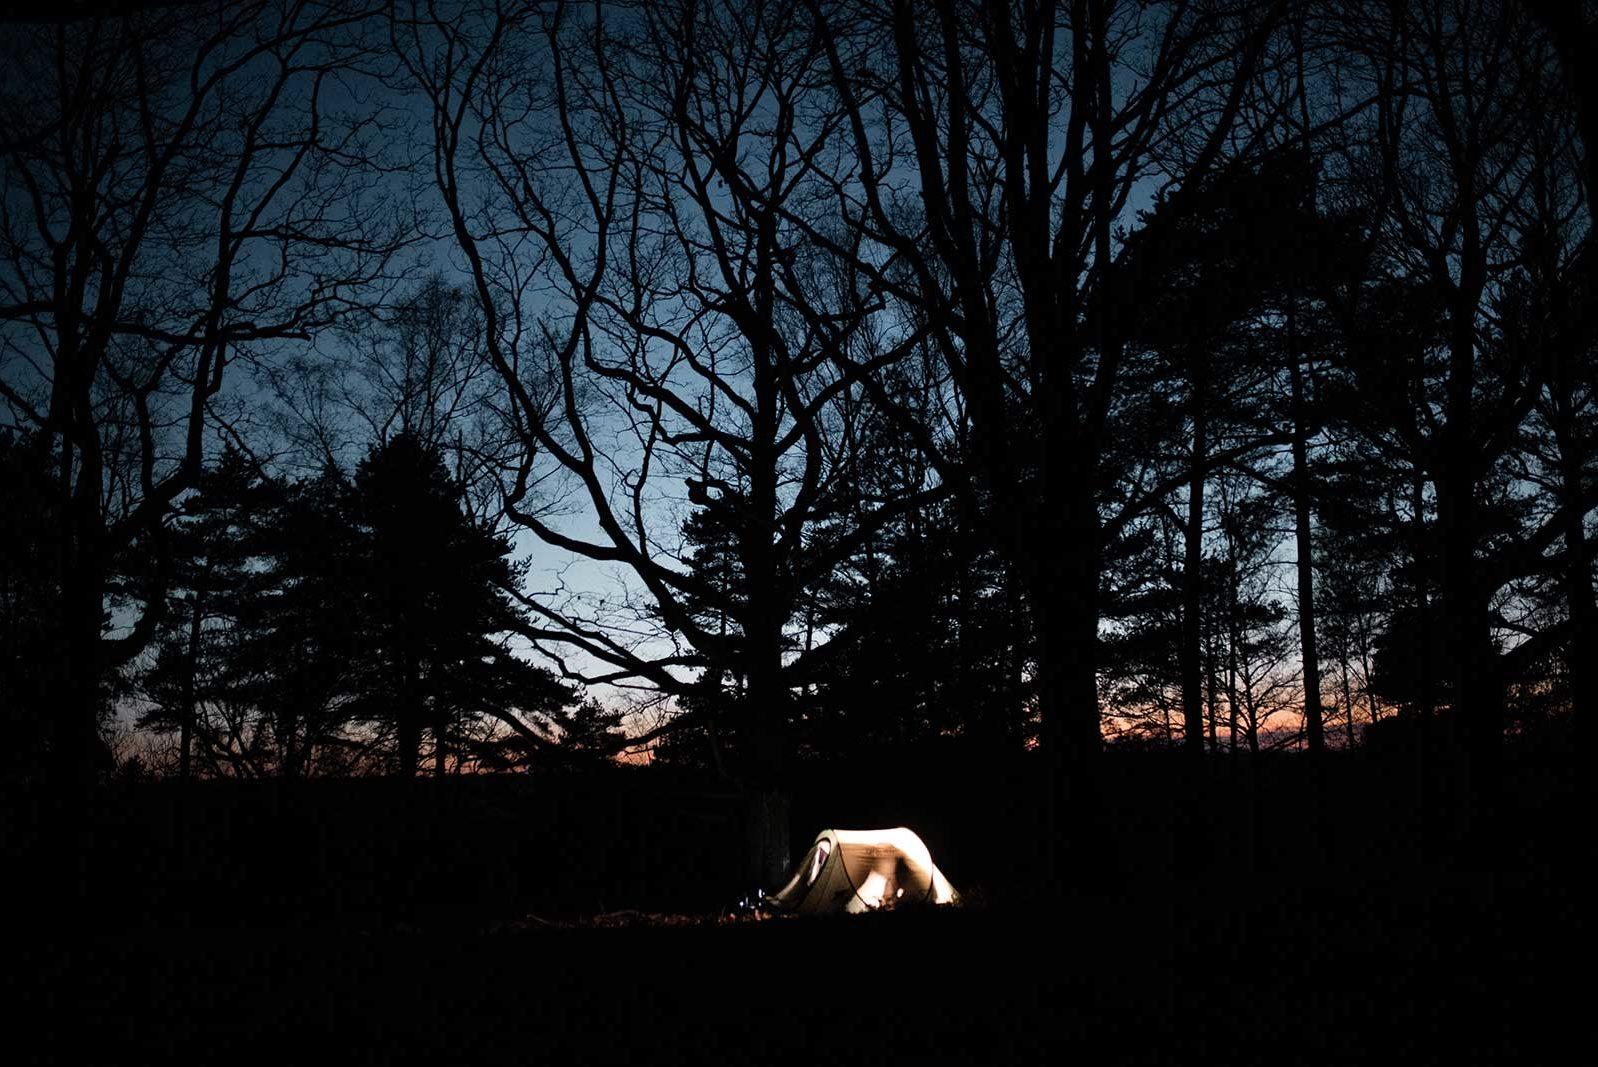 Tente illuminée au milieu de la nature de nuit.